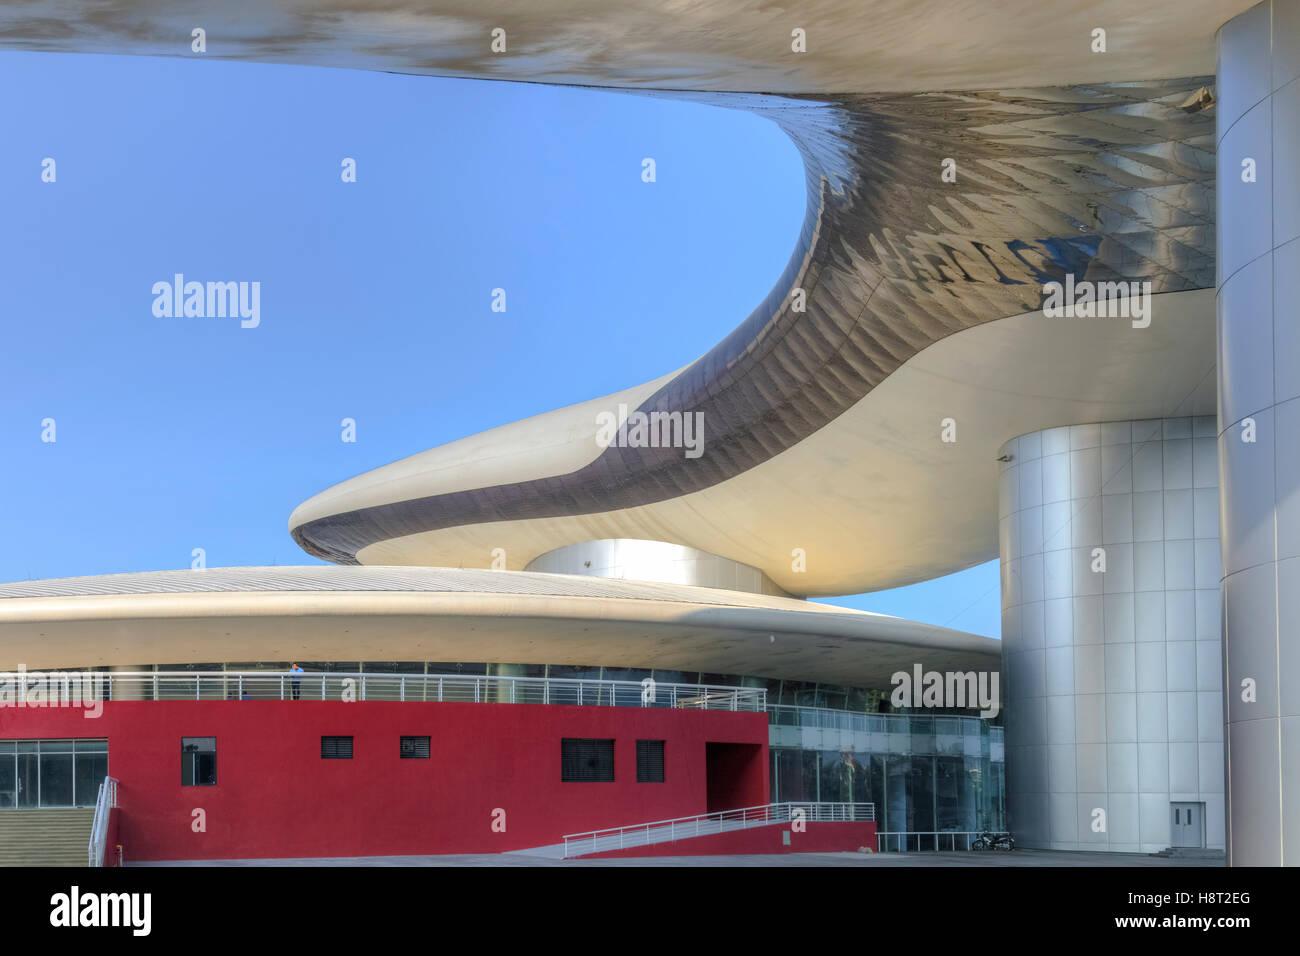 Quang Ninh Exhibition Center, Halong Bay, Vietnam, Indochina, Asia Stock Photo